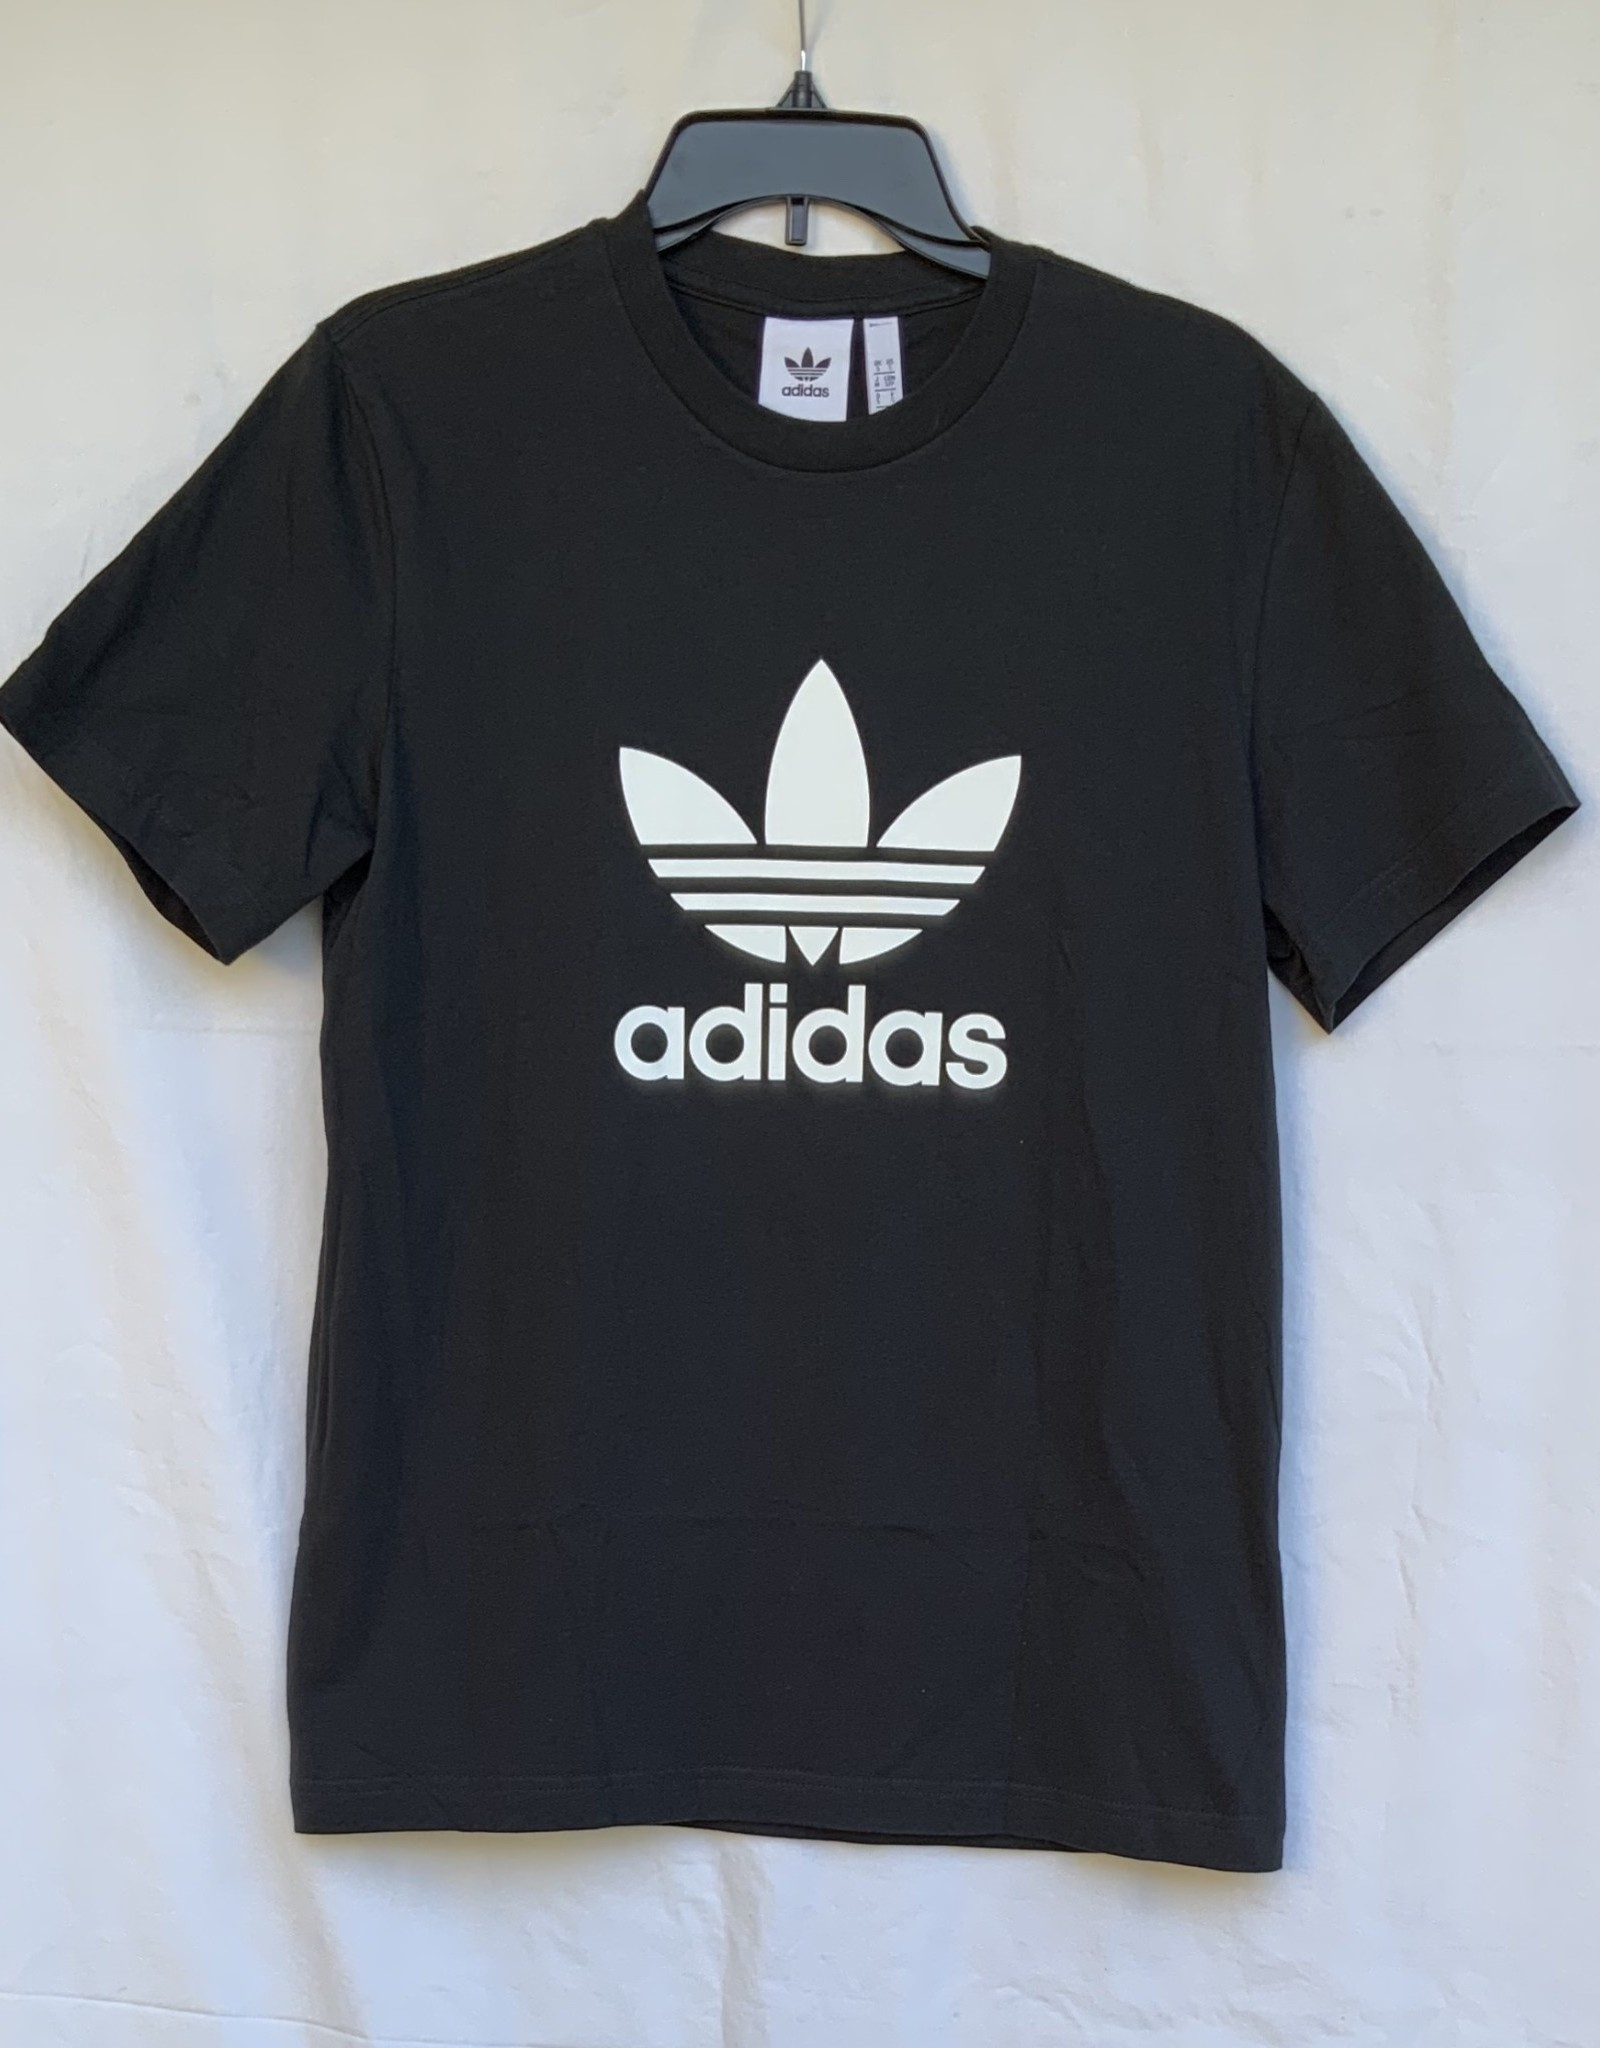 Adidas Adidas Trefoil T-Shirt